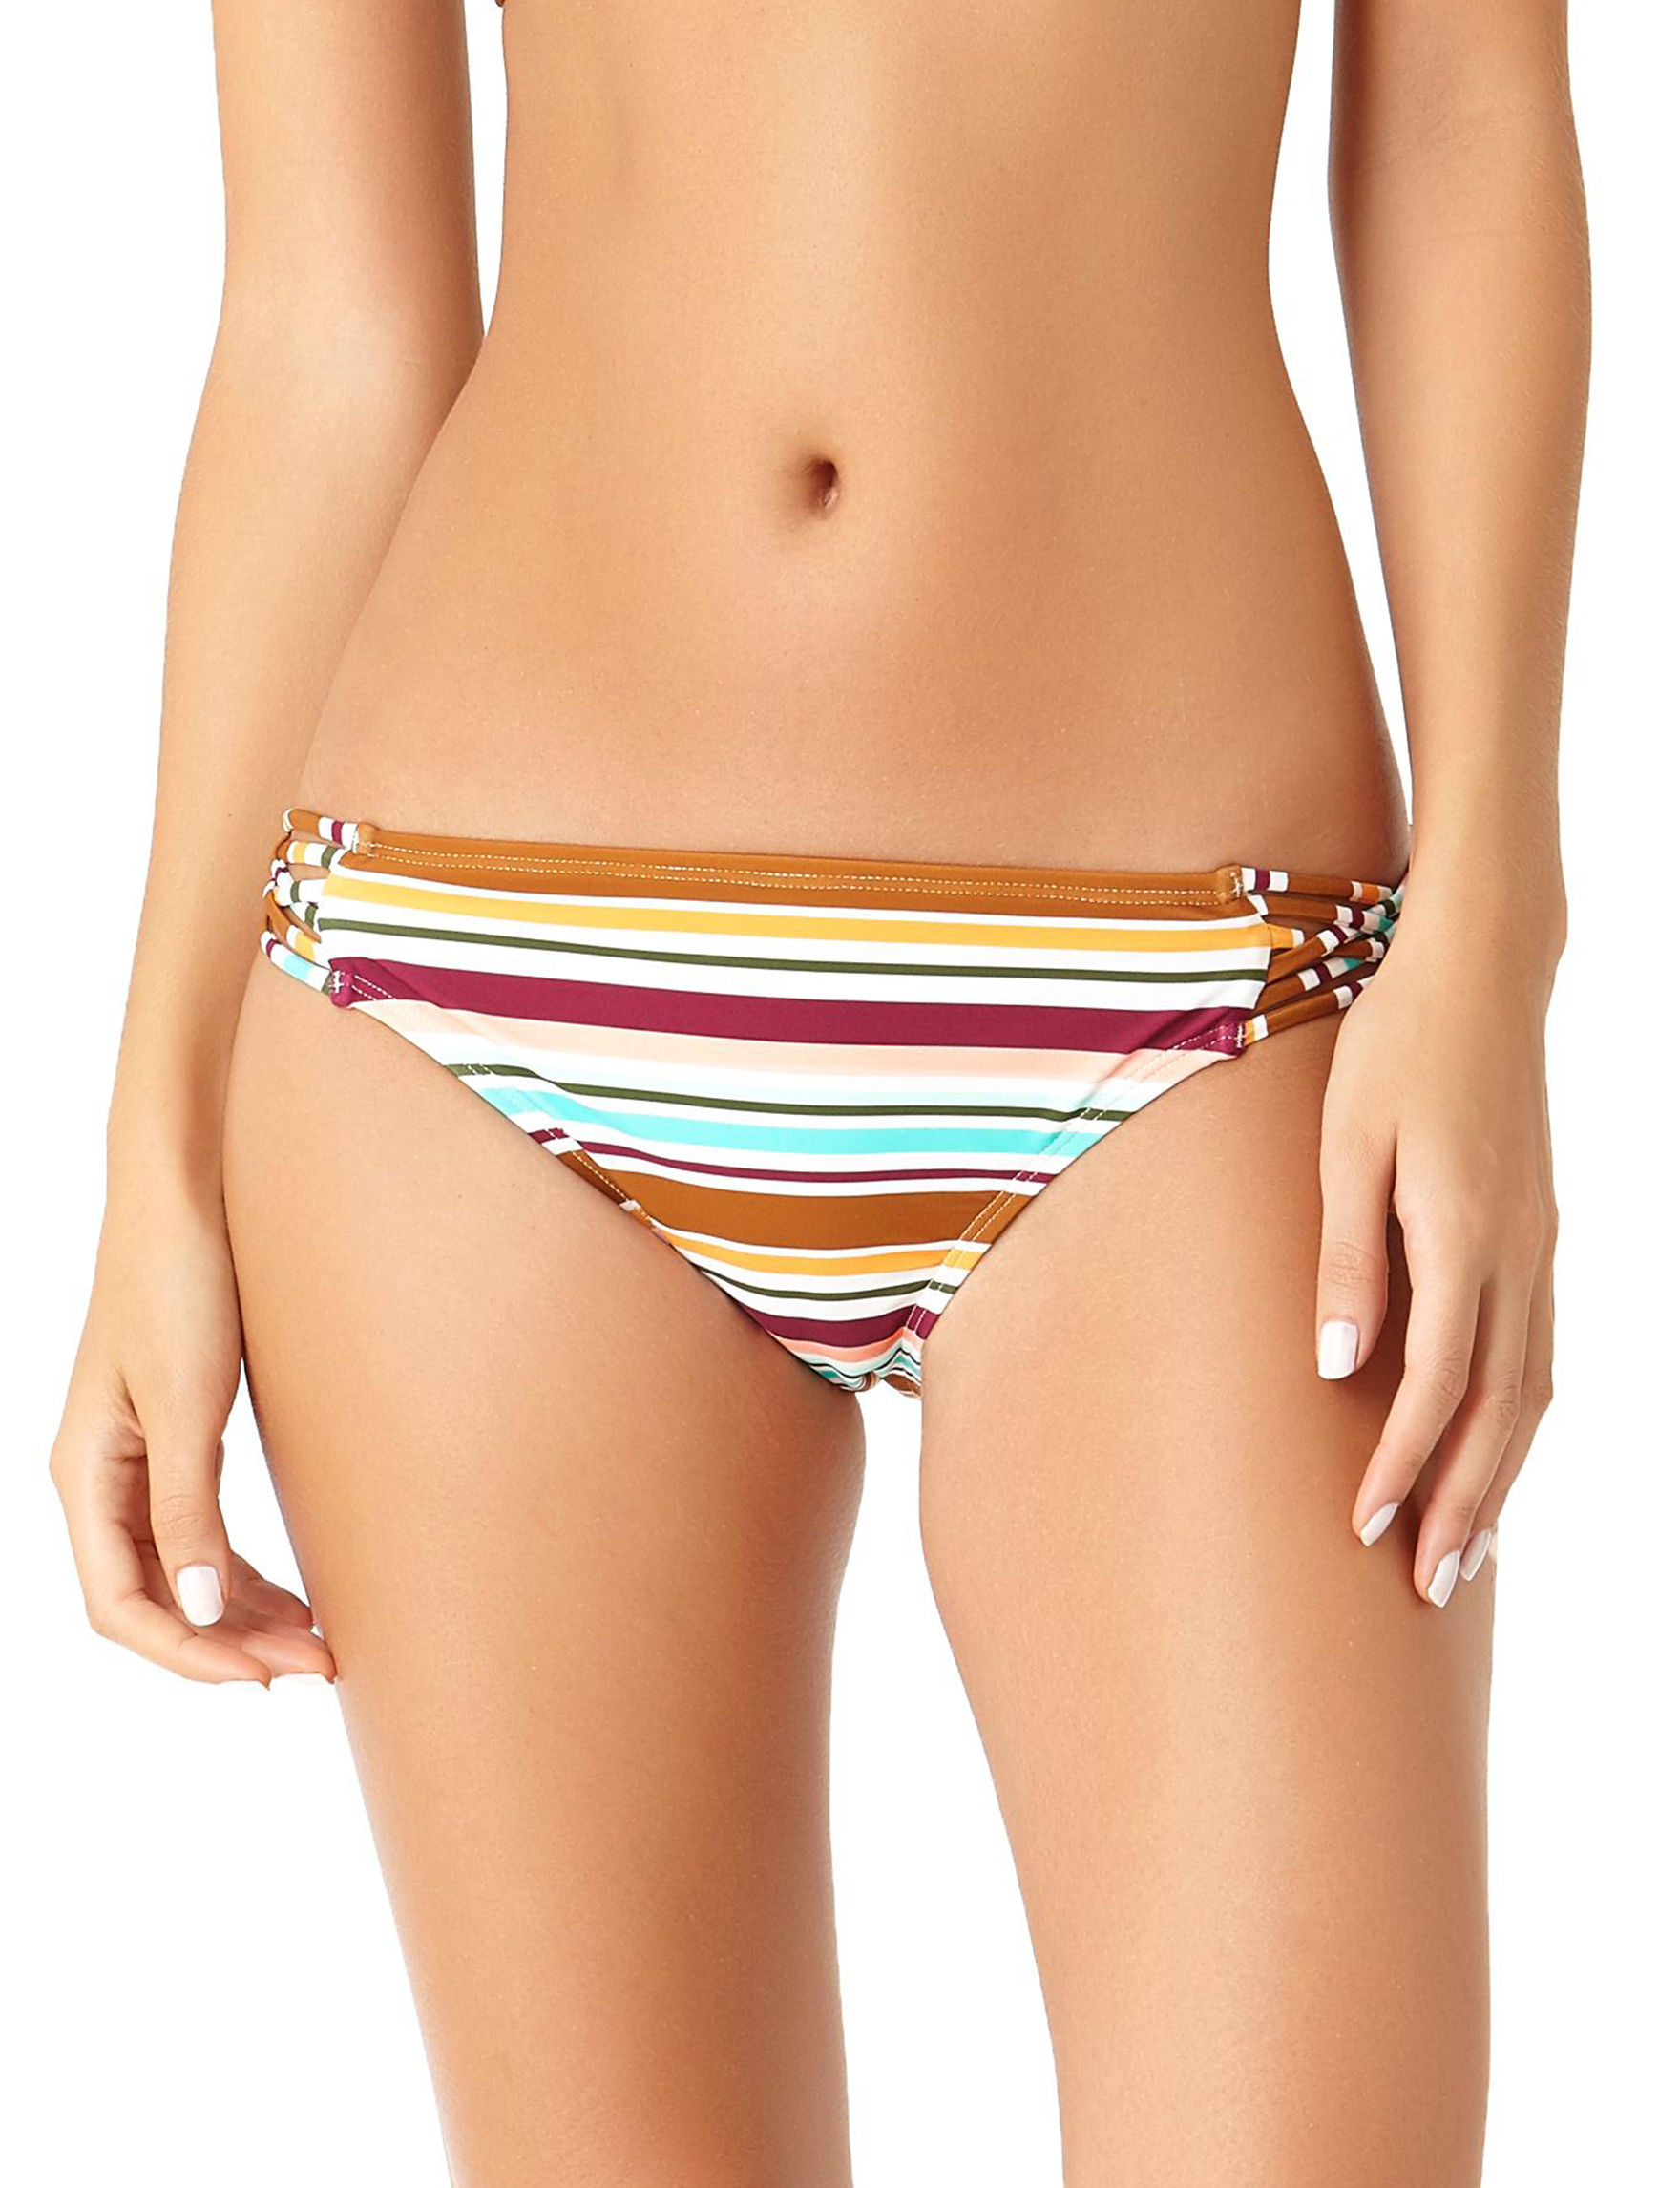 California Sunshine Multi Stripe Swimsuit Bottoms Hipster